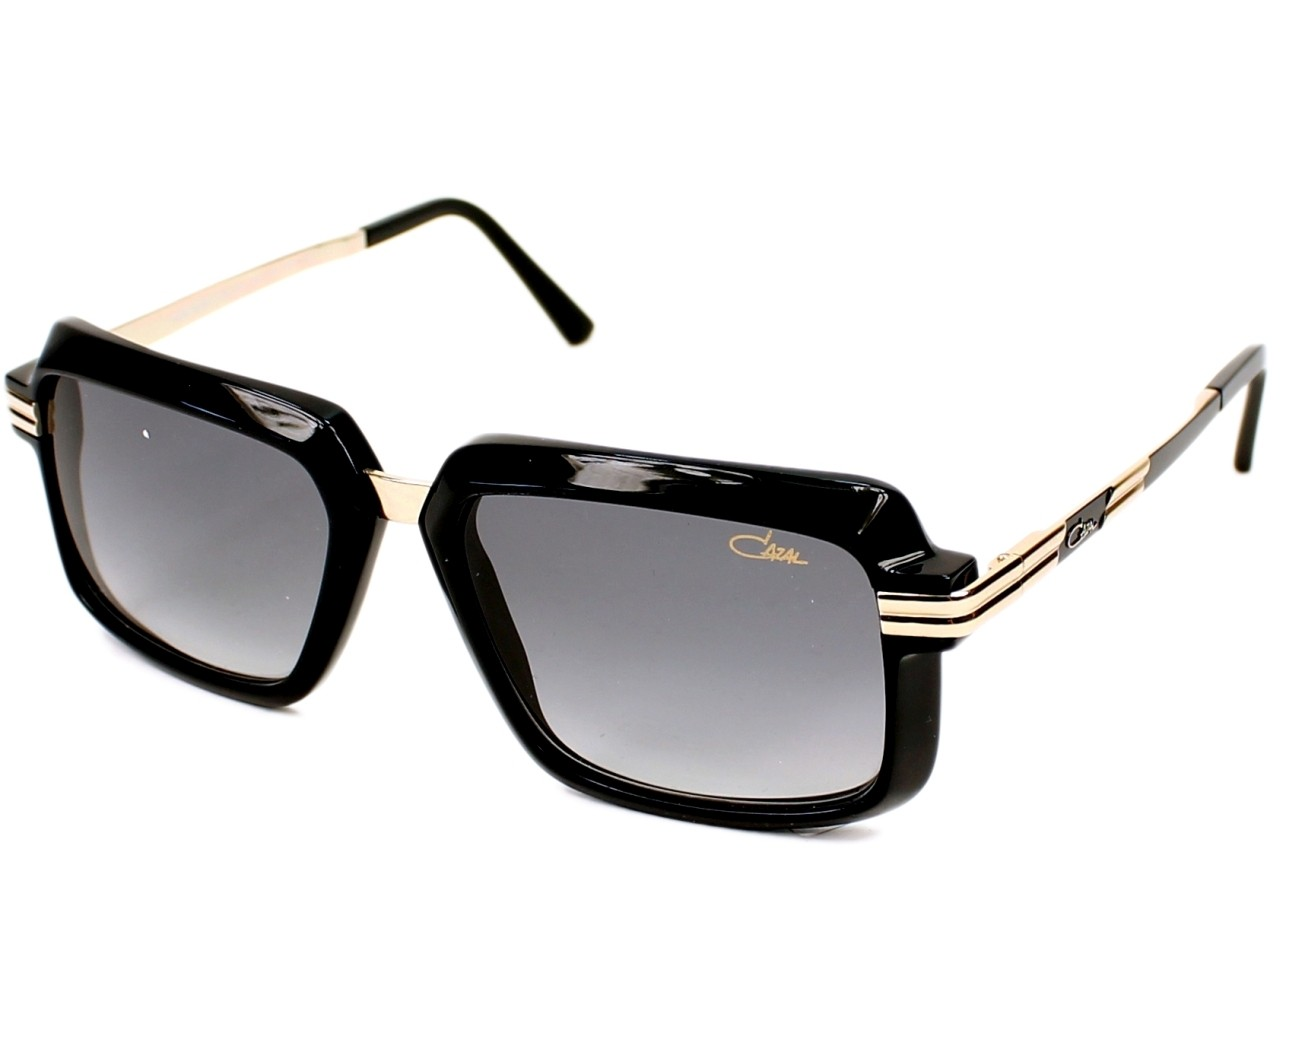 cazal sunglasses 6009 3 001 55 visionet. Black Bedroom Furniture Sets. Home Design Ideas